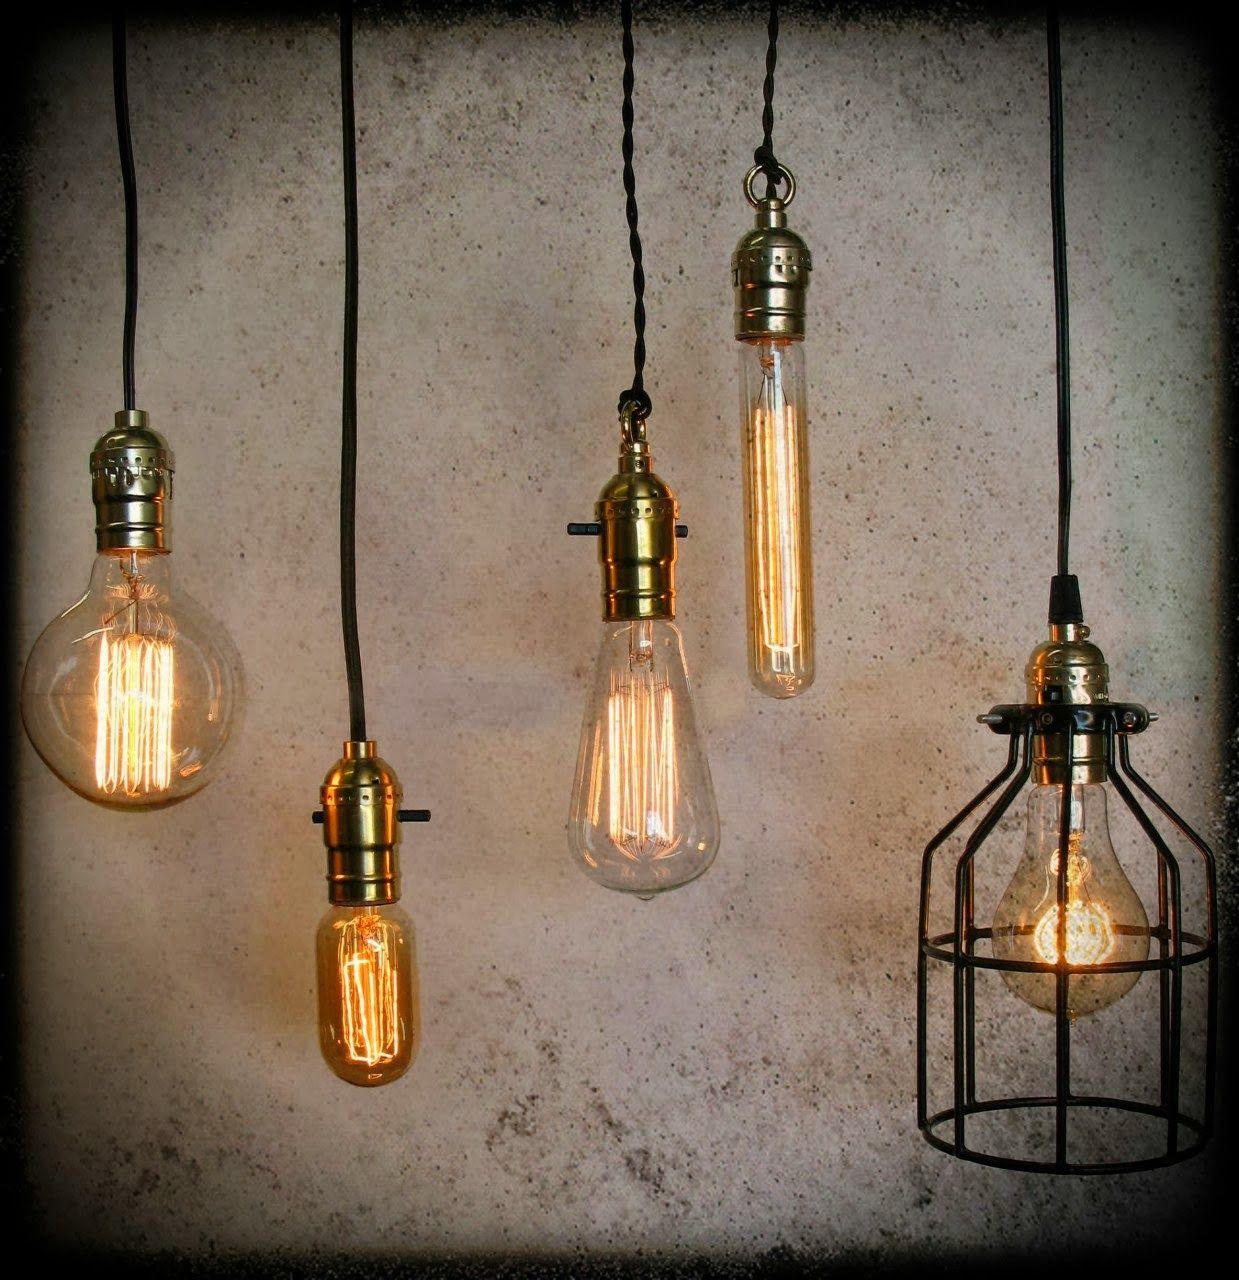 1000+ images about lighting on pinterest | hanging lights, big